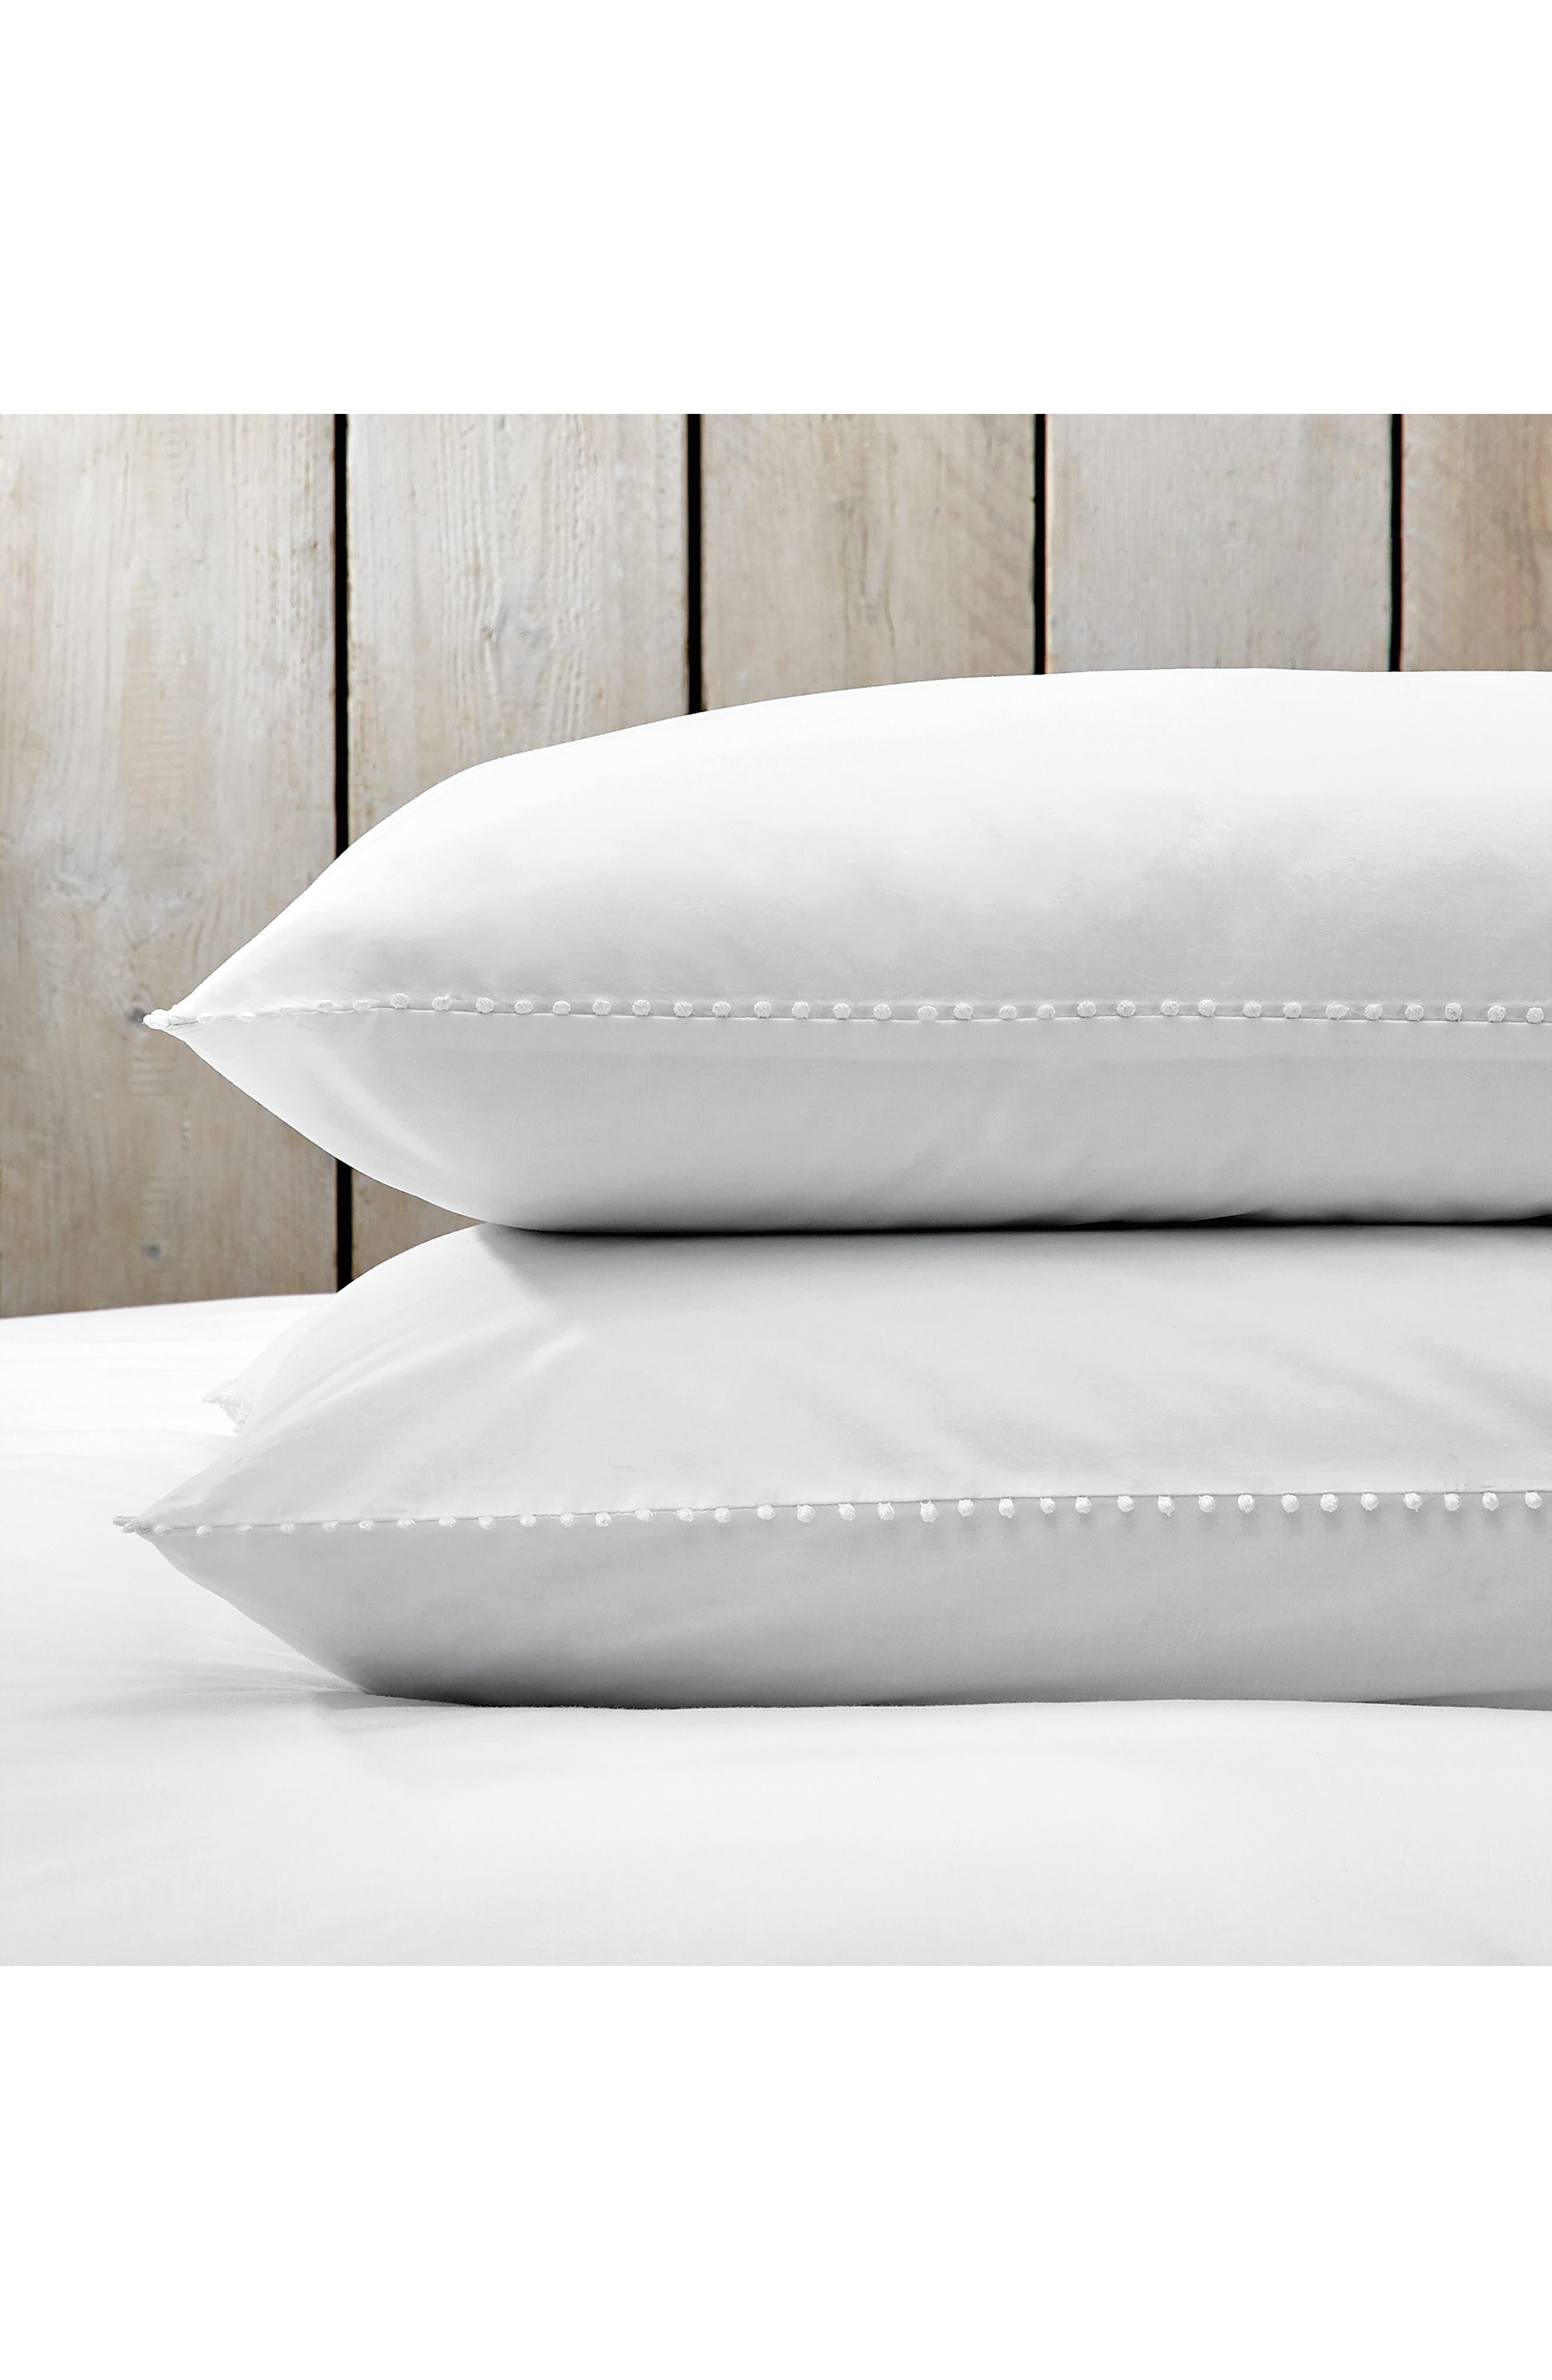 THE WHITE COMPANY, Avignon 200 Thread Count Euro Pillowcase, Main thumbnail 1, color, WHITE